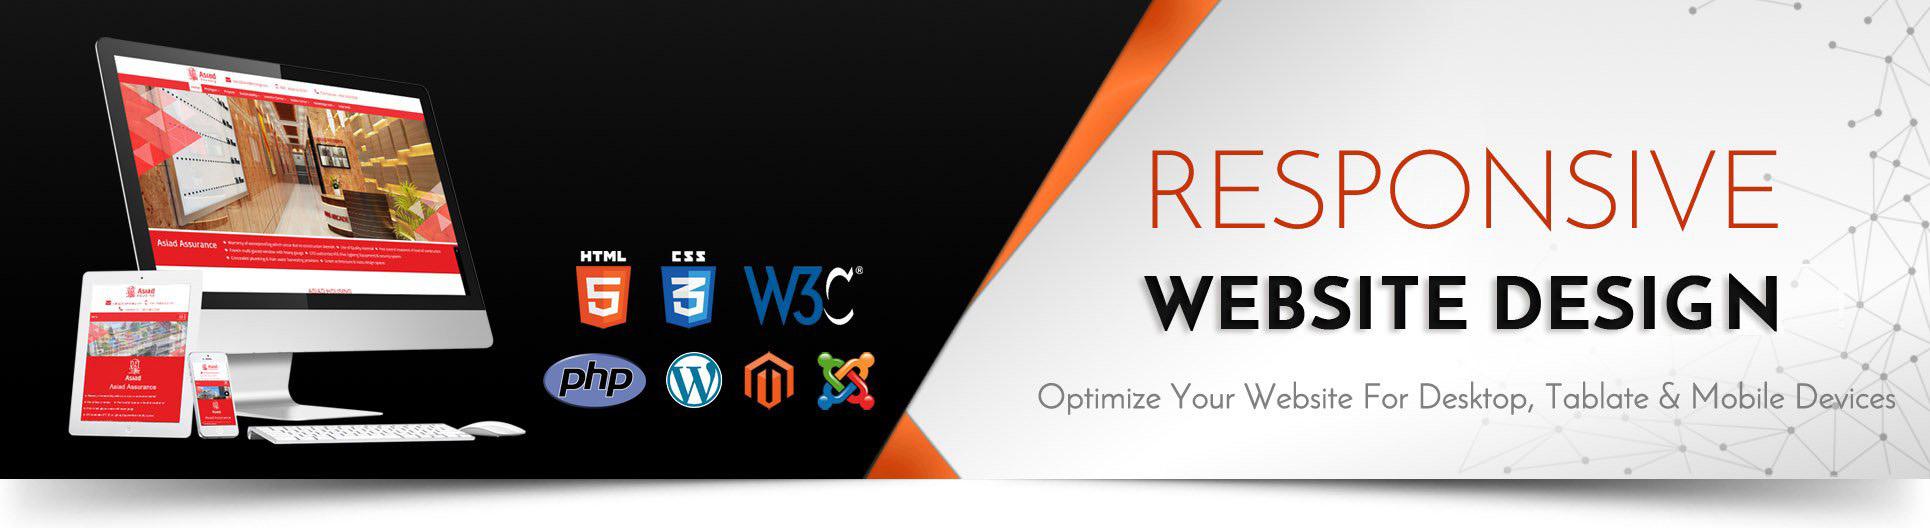 Responsive Web Design Company In Mumbai